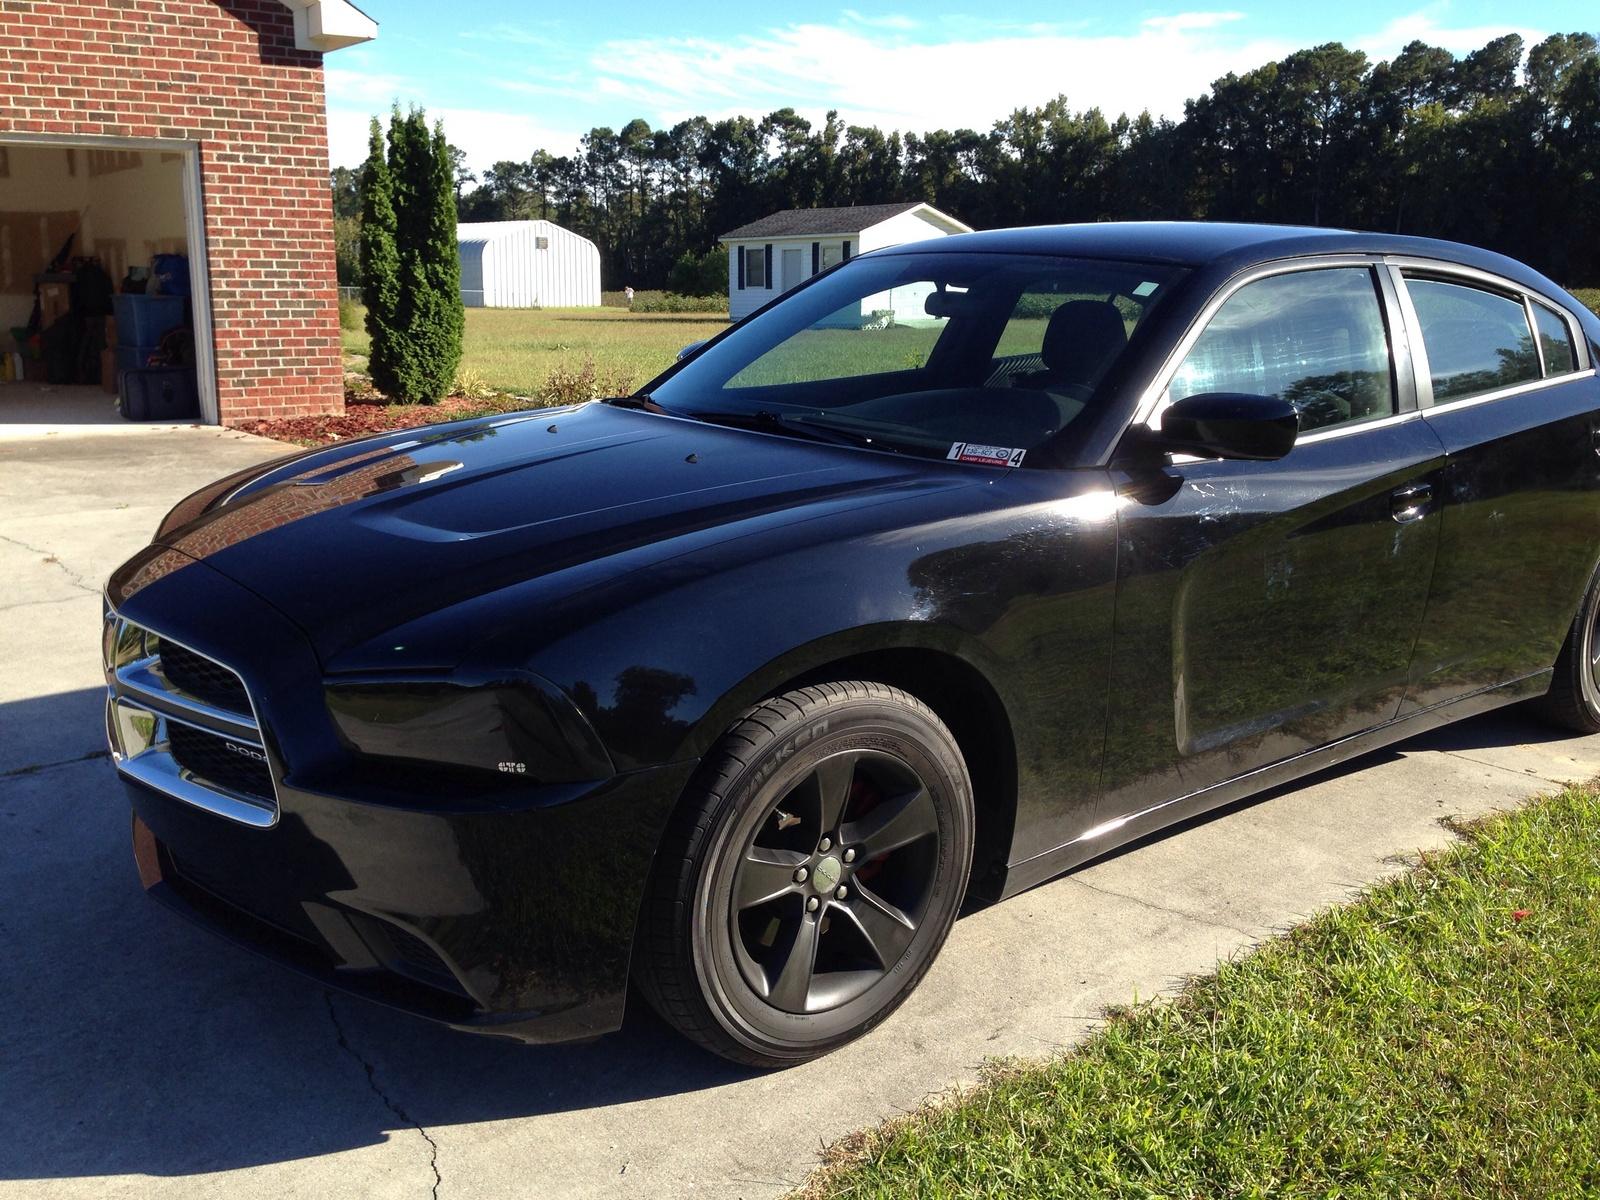 2012 dodge charger se top speed car autos gallery. Black Bedroom Furniture Sets. Home Design Ideas